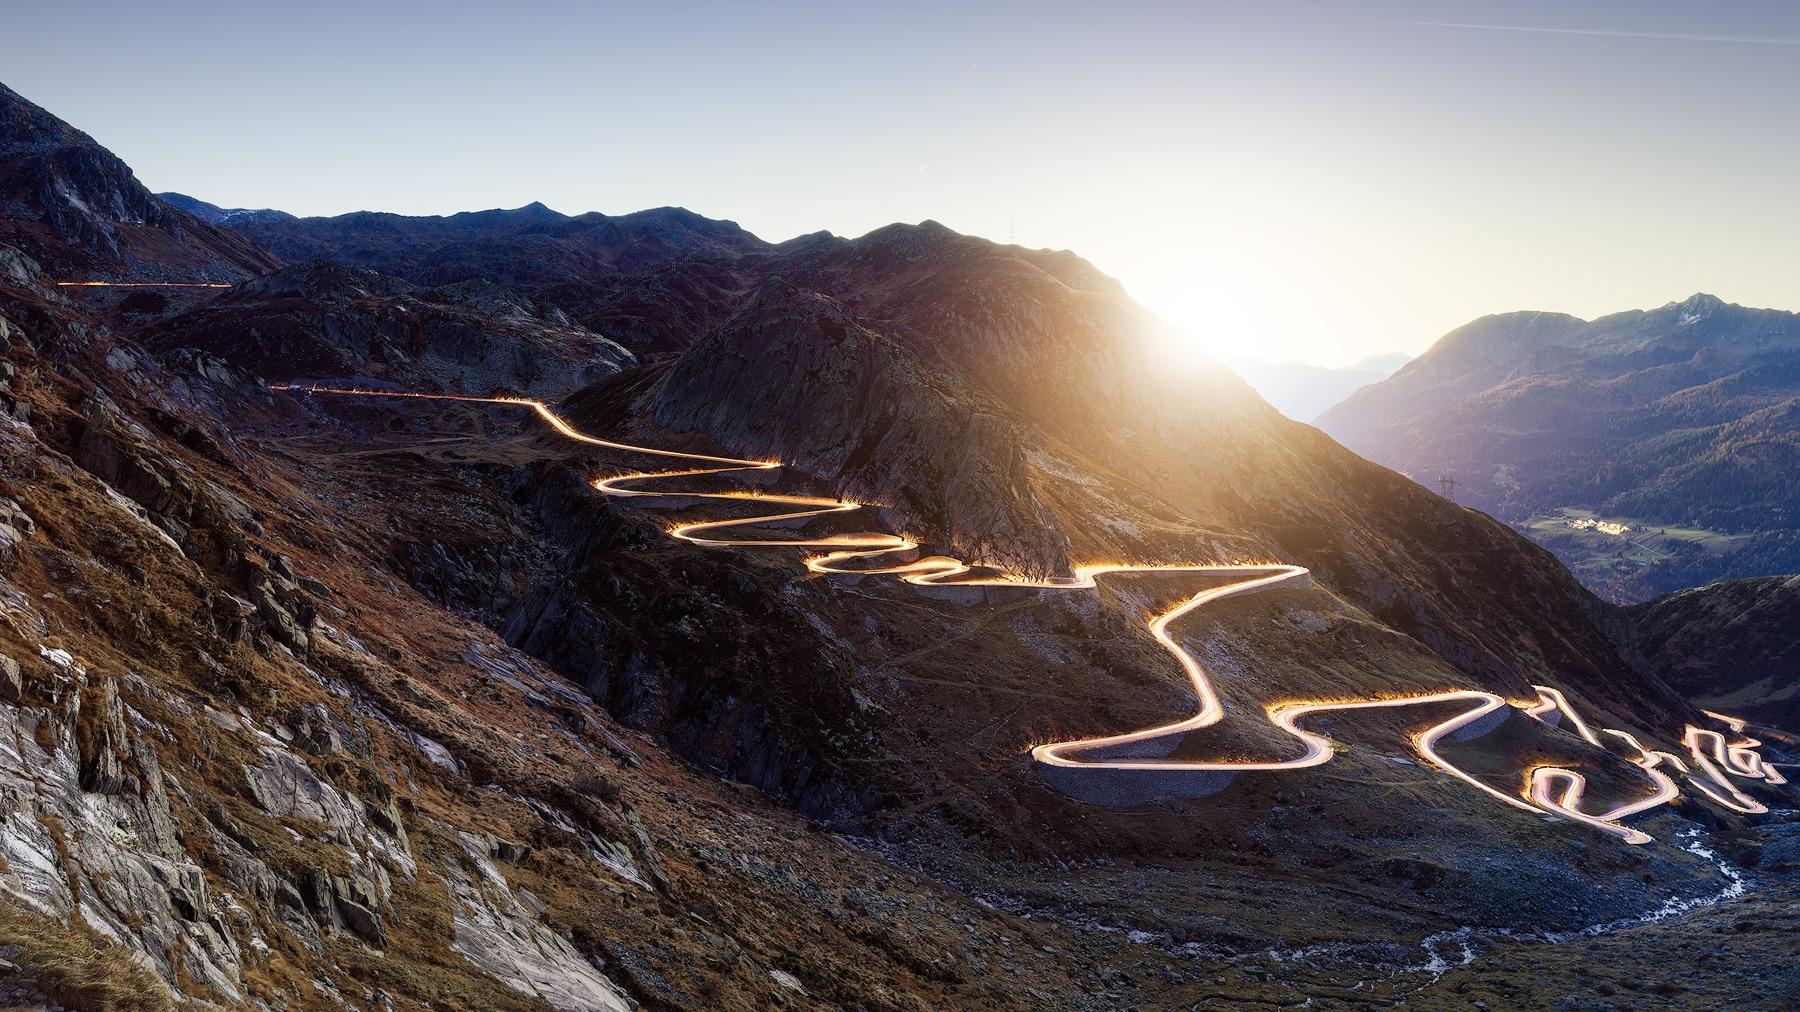 Sonnenaufgang an der Tremola - historische Passstrasse am Gotthard